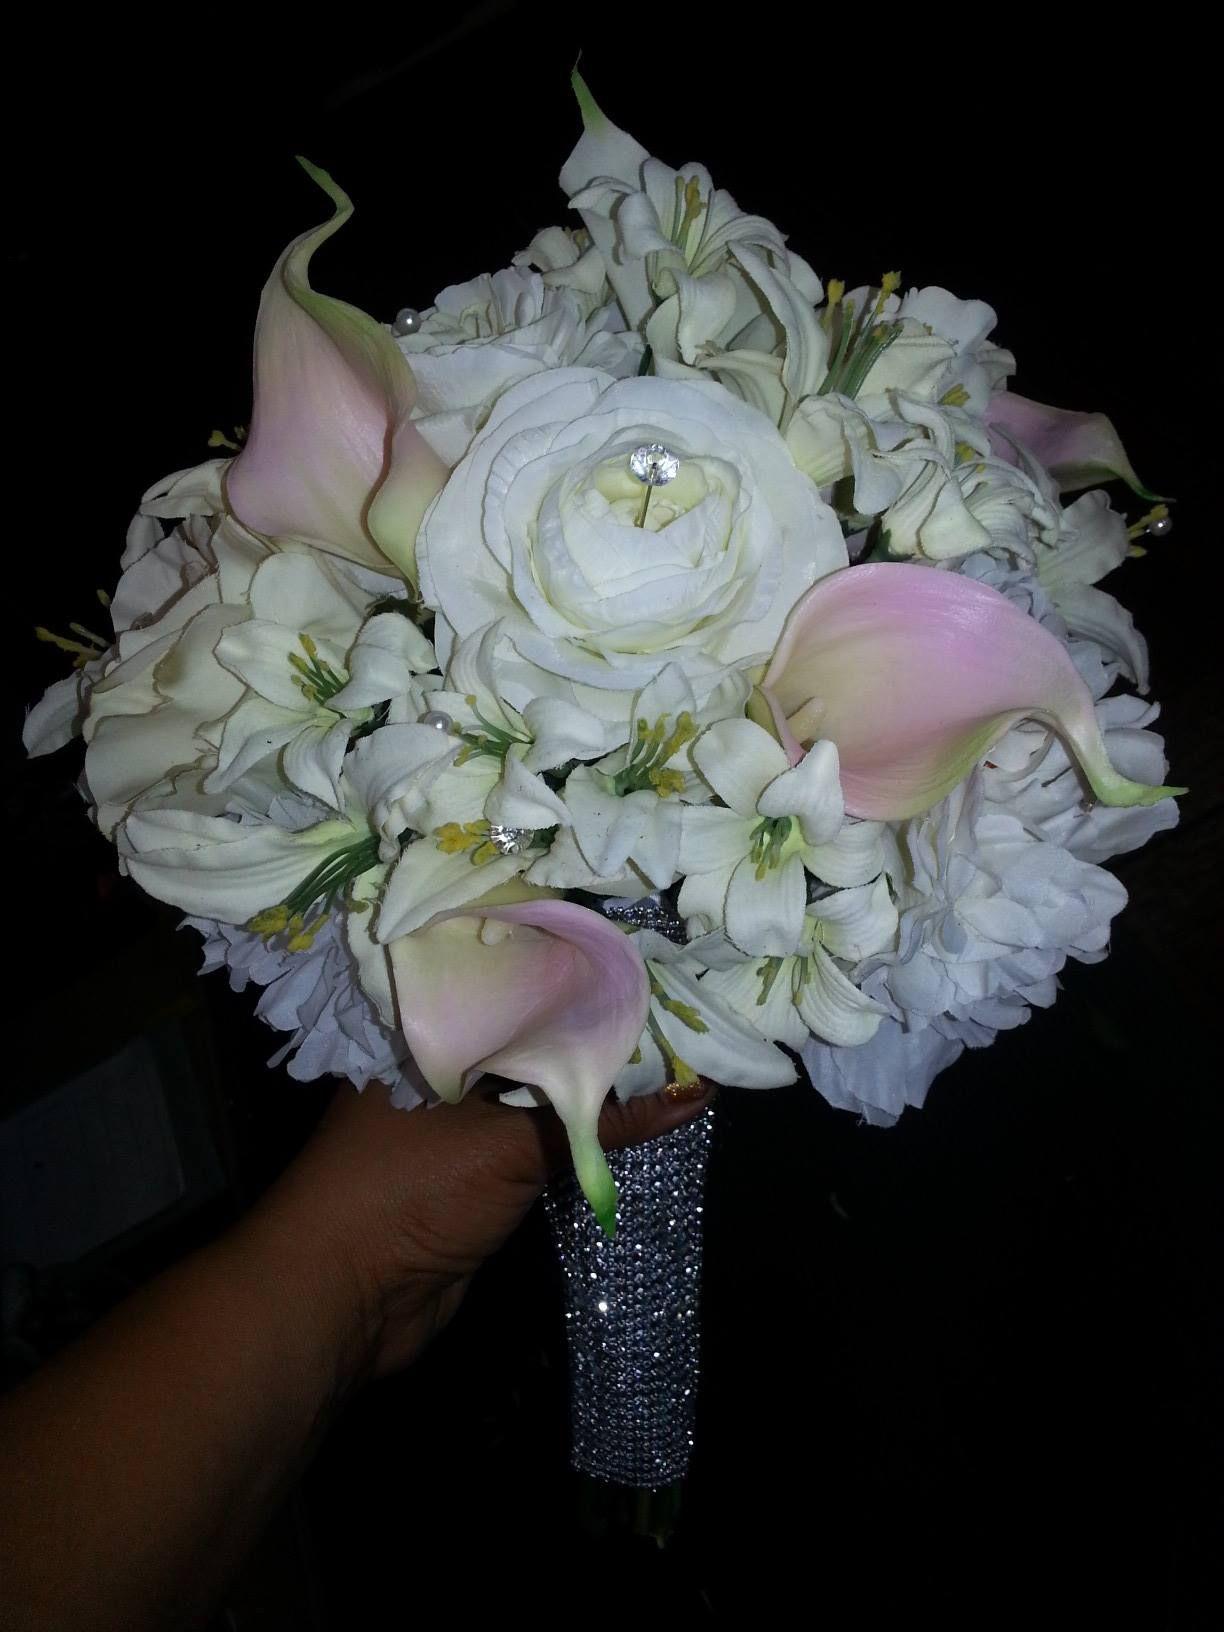 Pin By Le Doigte Beni De M Piquey On Elegant Events By Rachel Wedding Designs Flowers Wedding